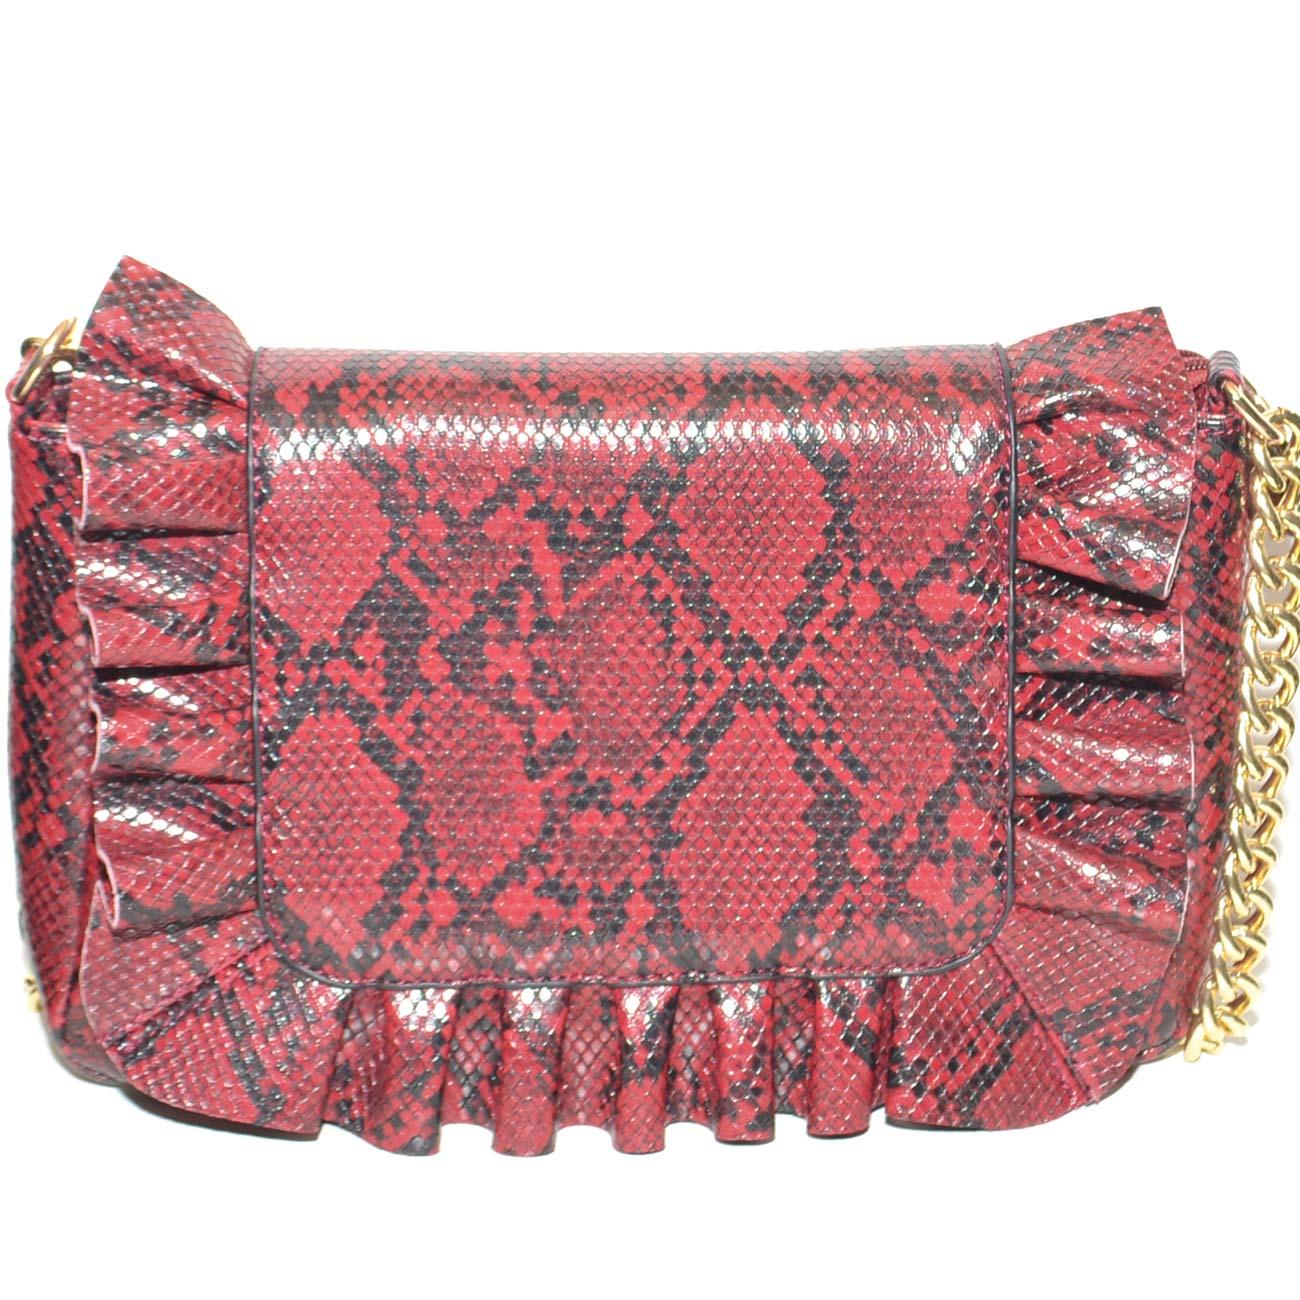 769b993756 Pochette donna borsa piccola rossa animalier con polsiera e catene ...